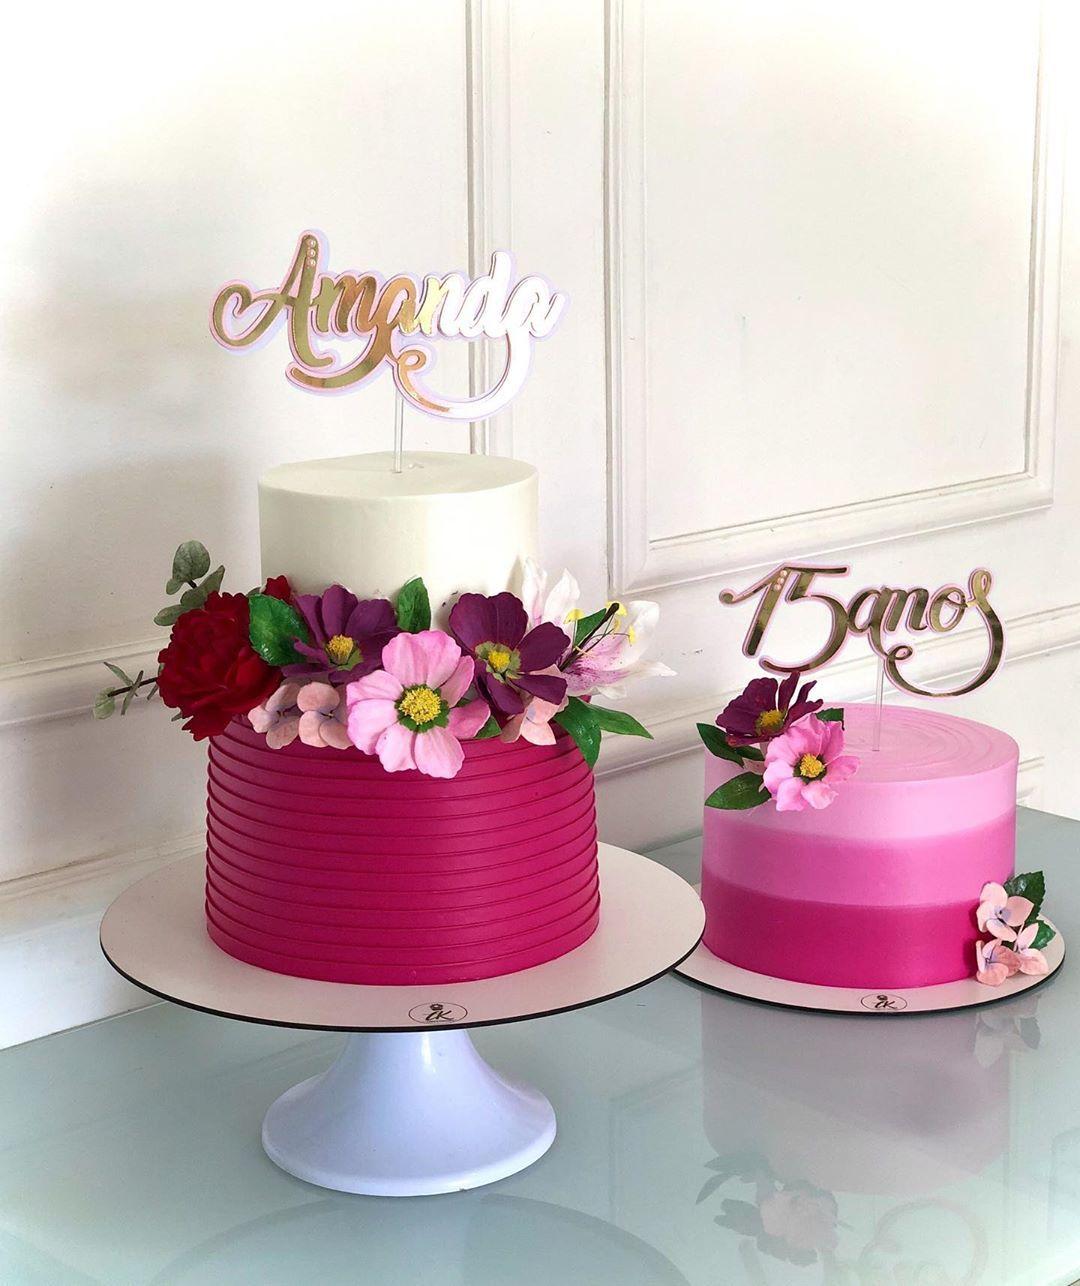 2 111 Curtidas 46 Comentarios Tk Cakes Cupcakes Tkcakes